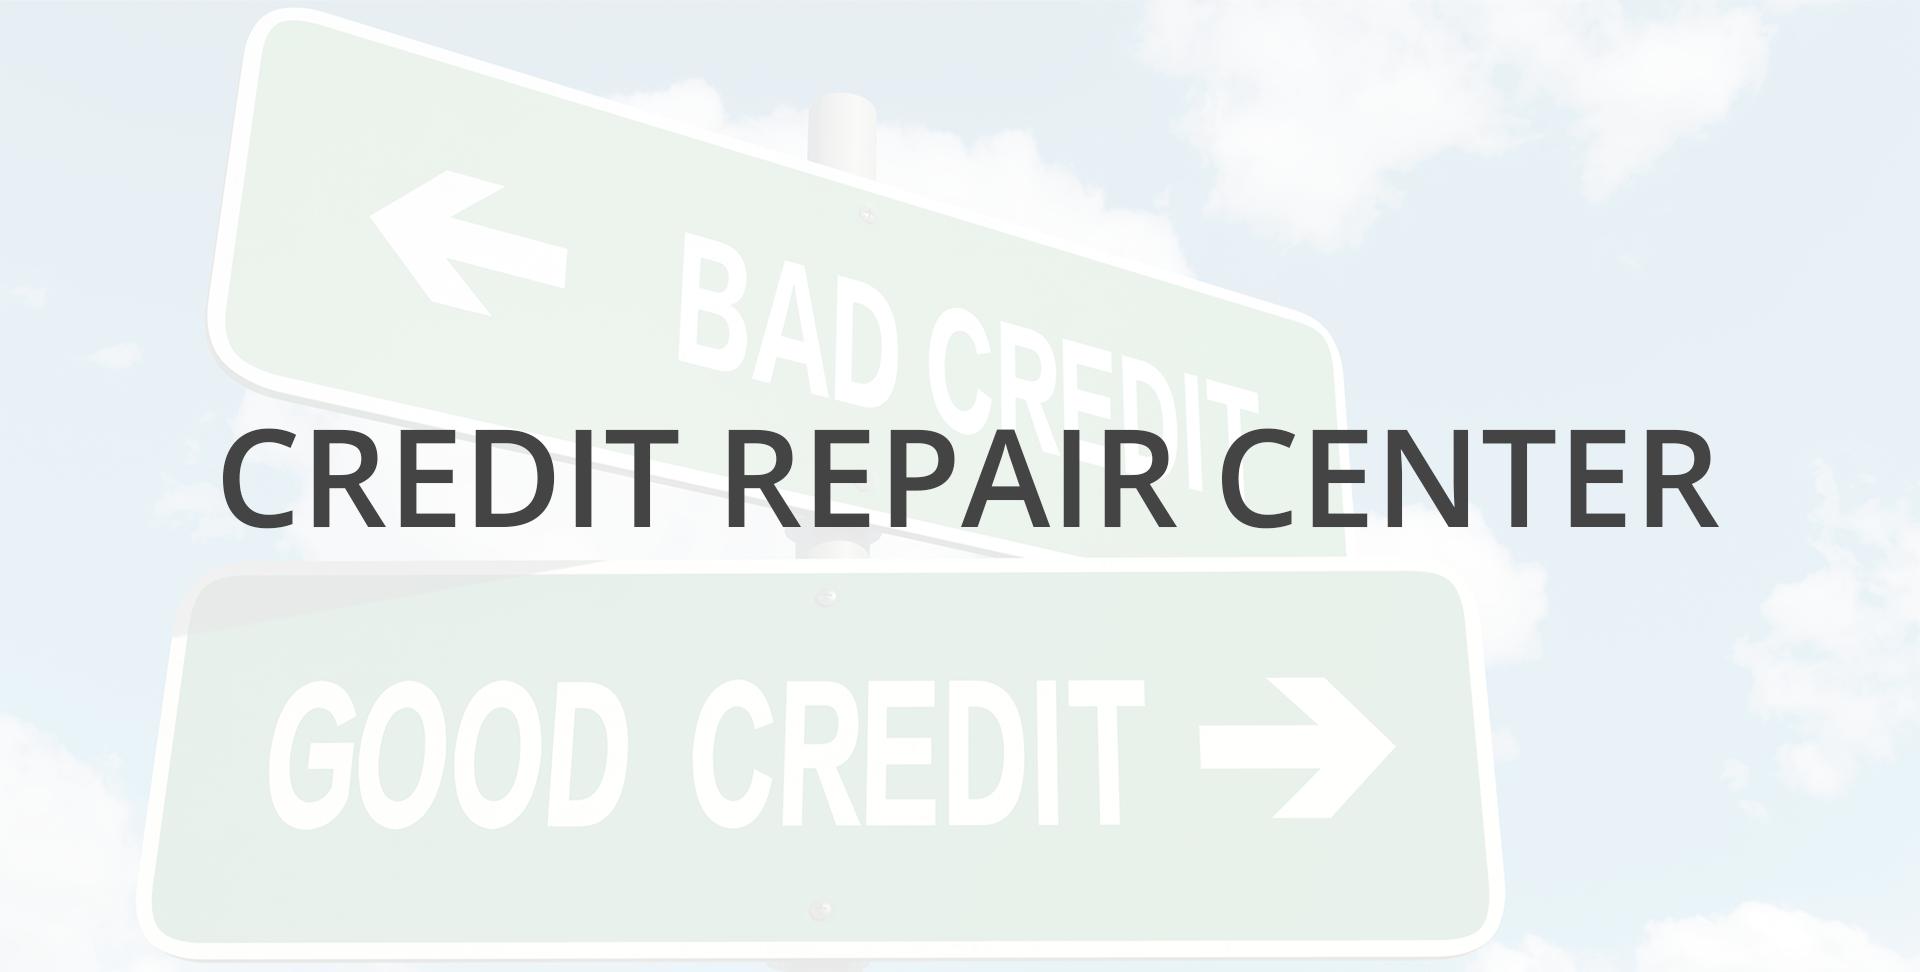 Credit Repair Center Little Rock Ar